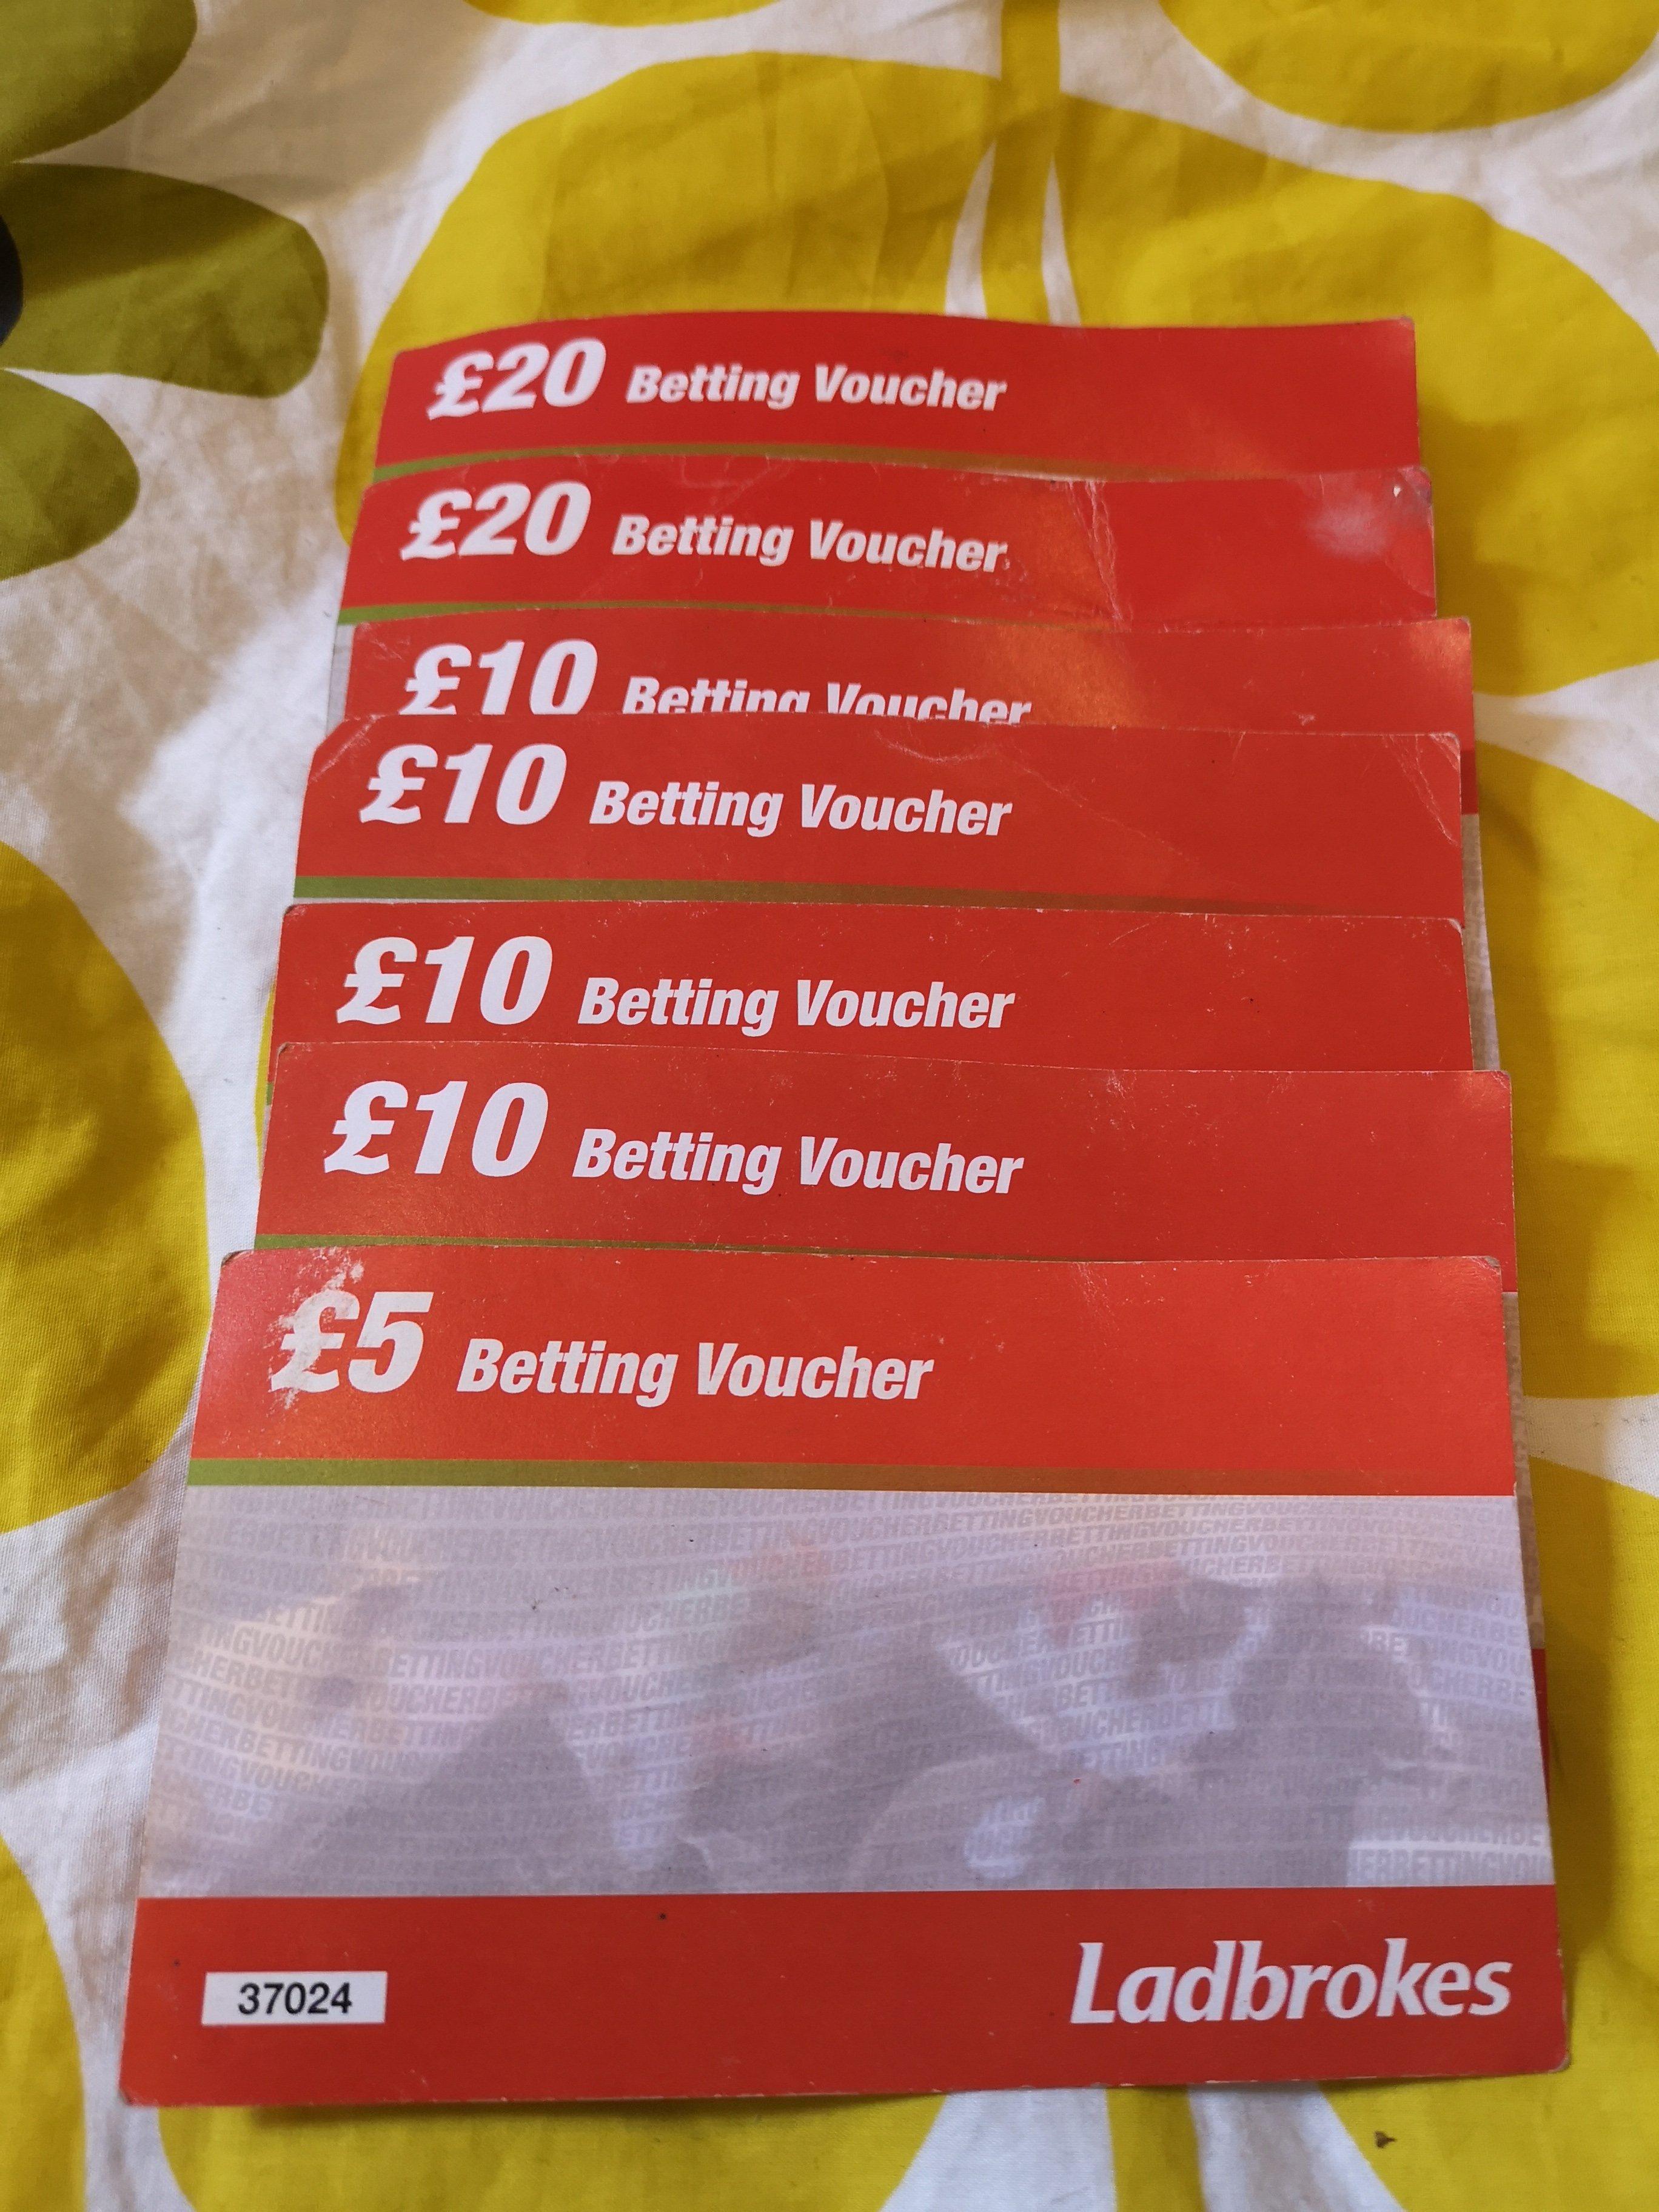 Ladbrokes betting vouchers sports betting world cup odds